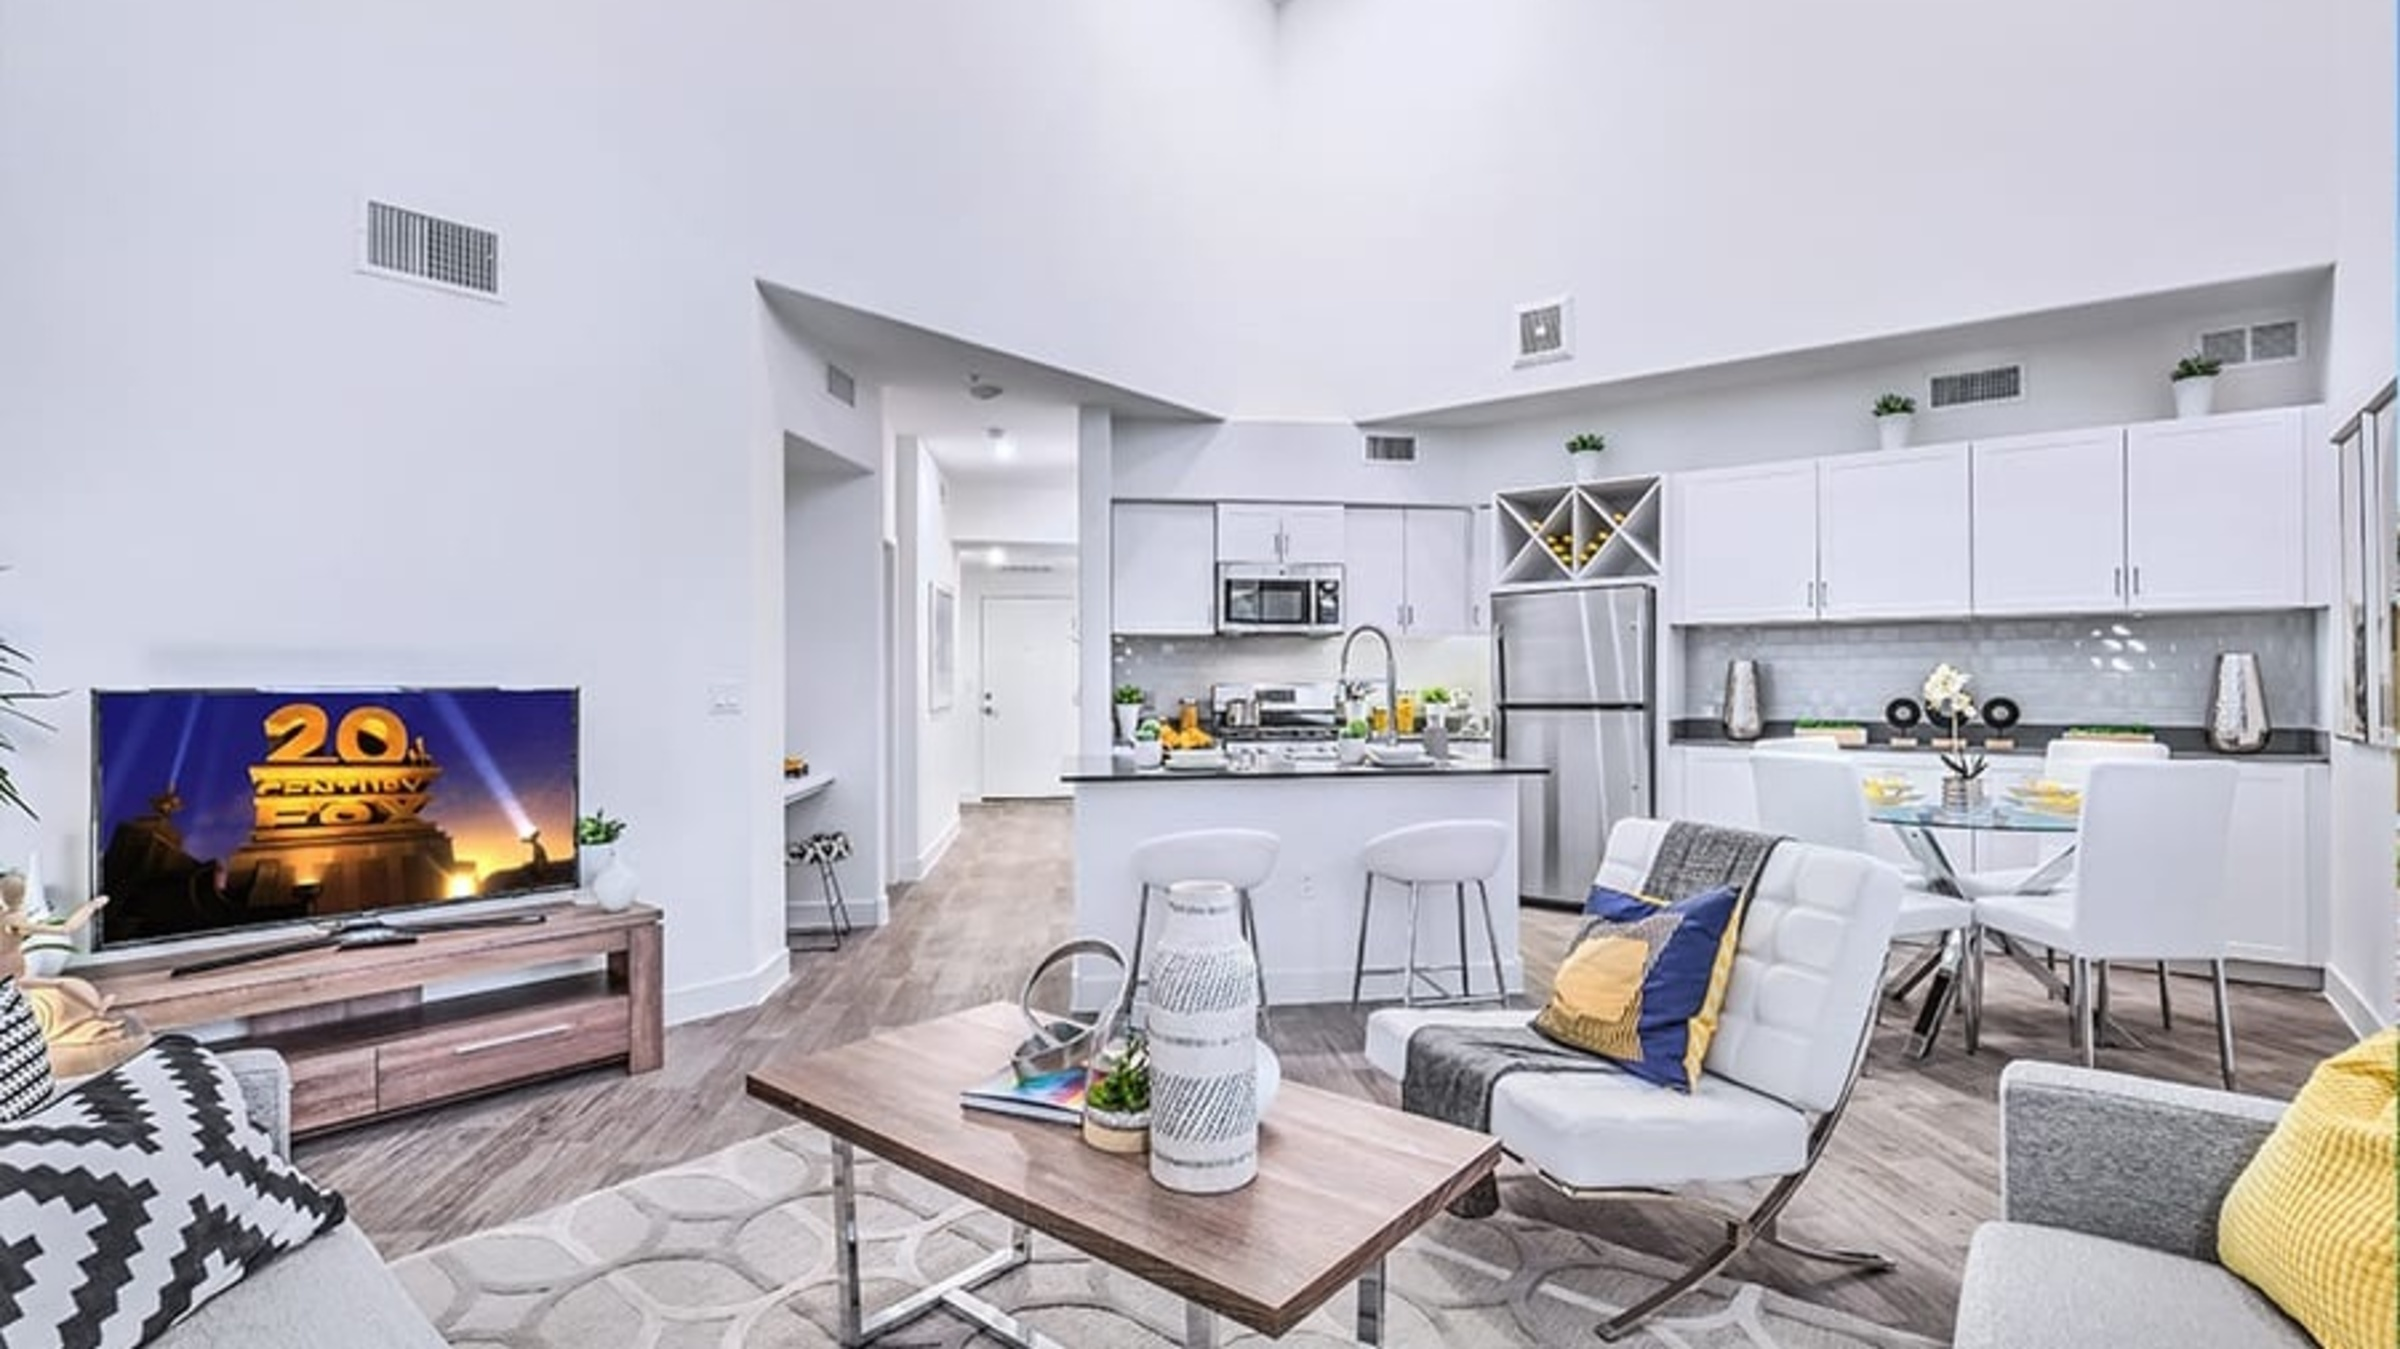 Imagine Apartments 2306 rental